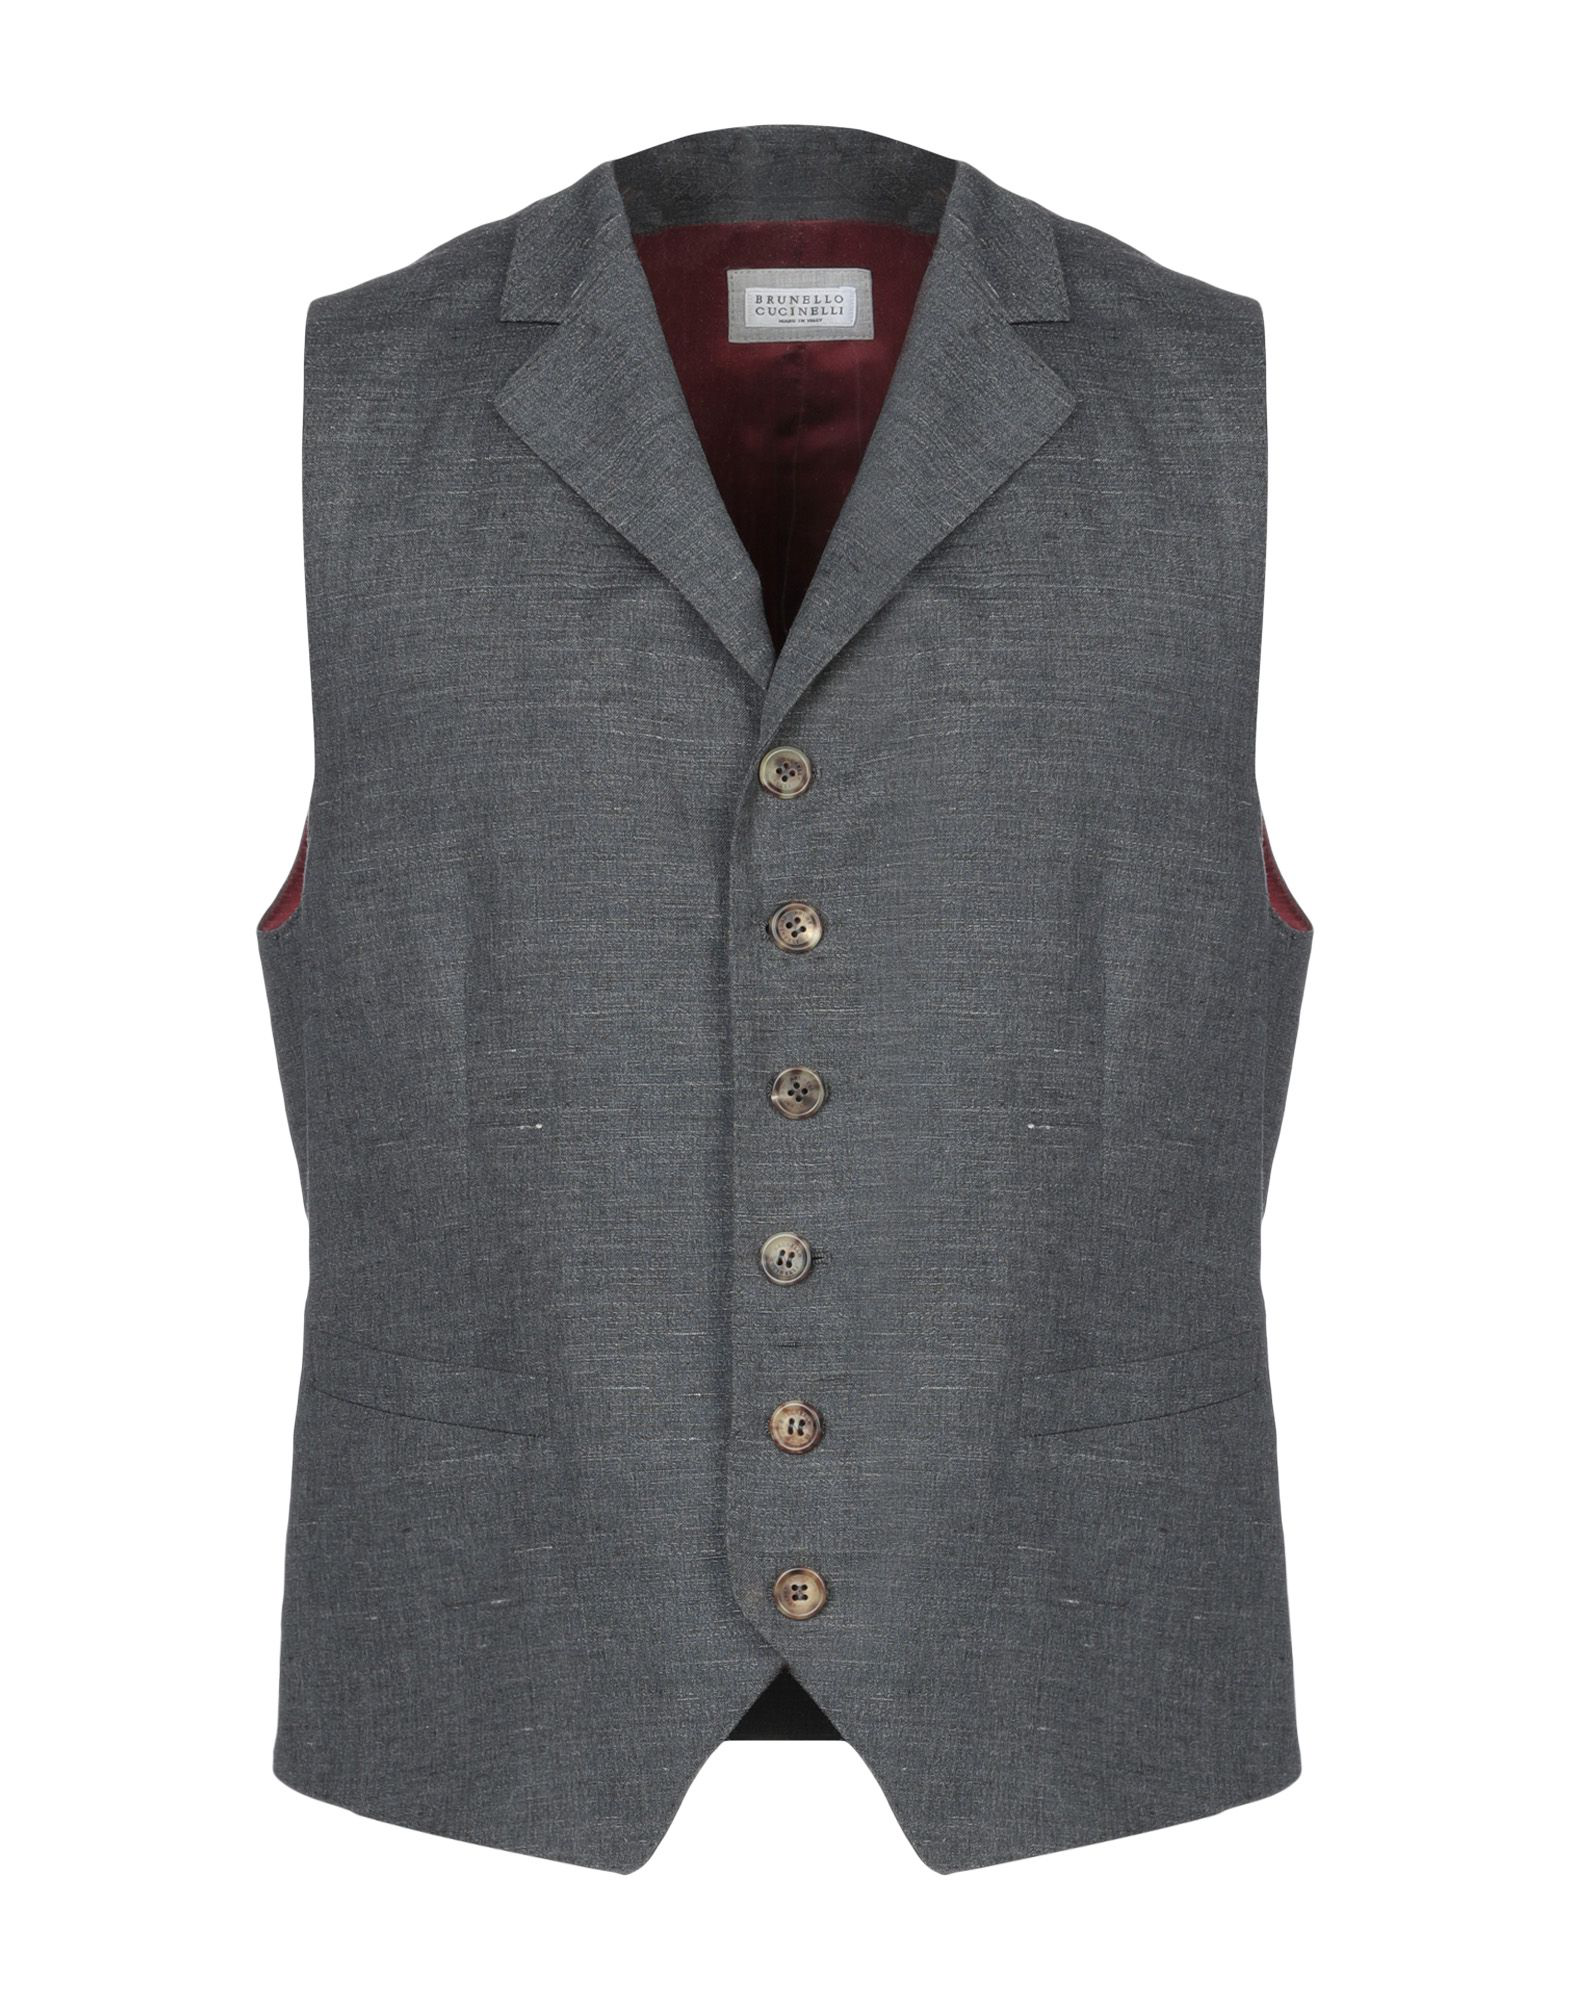 Brunello Cucinelli Suit Vest In Lead